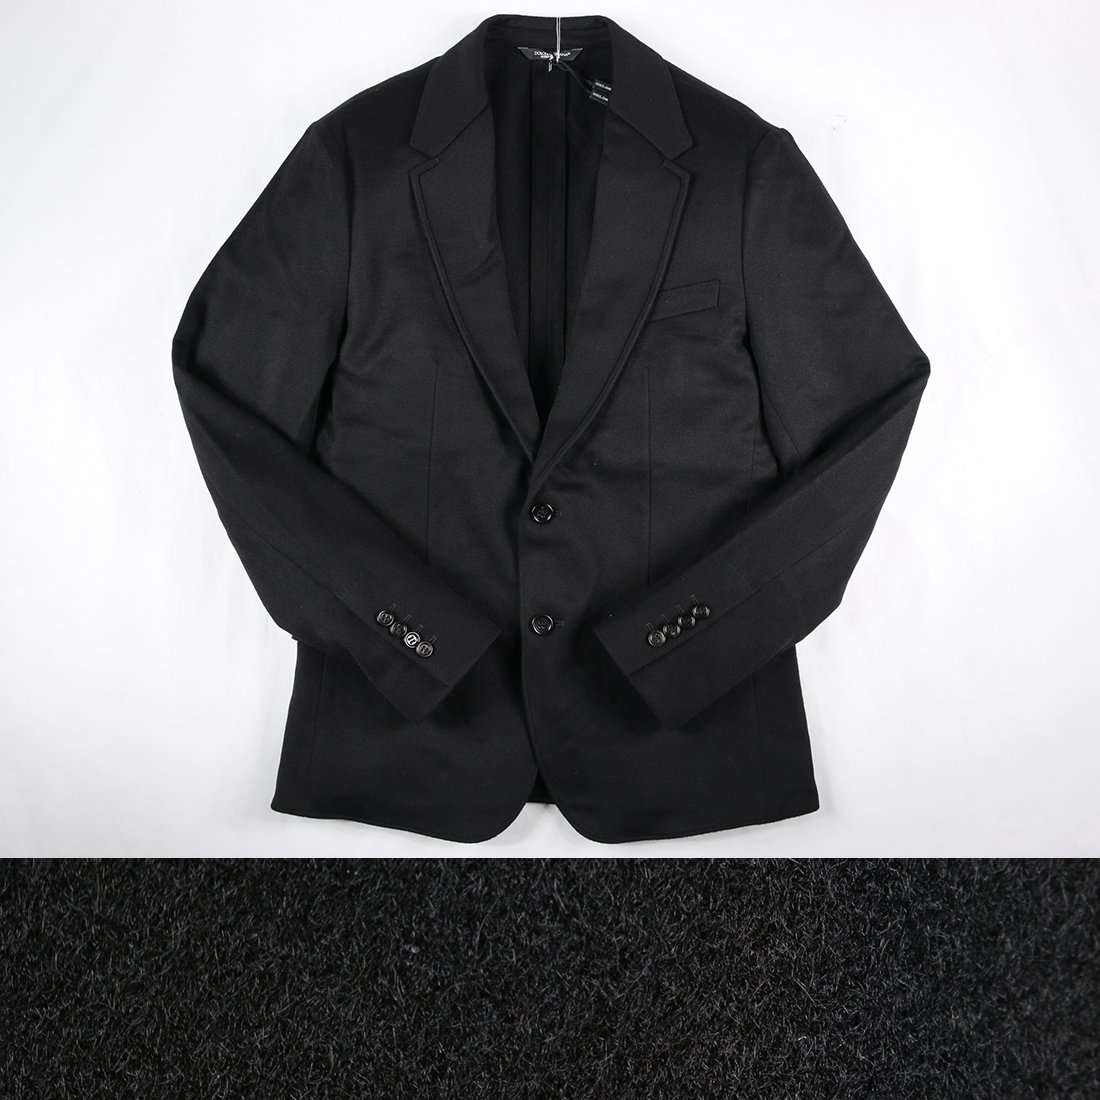 Dolce&Gabbana ジャケット G2DP7TFU2X 11188 [並行輸入品] B075VRV39Y 54|ブラック ブラック 54